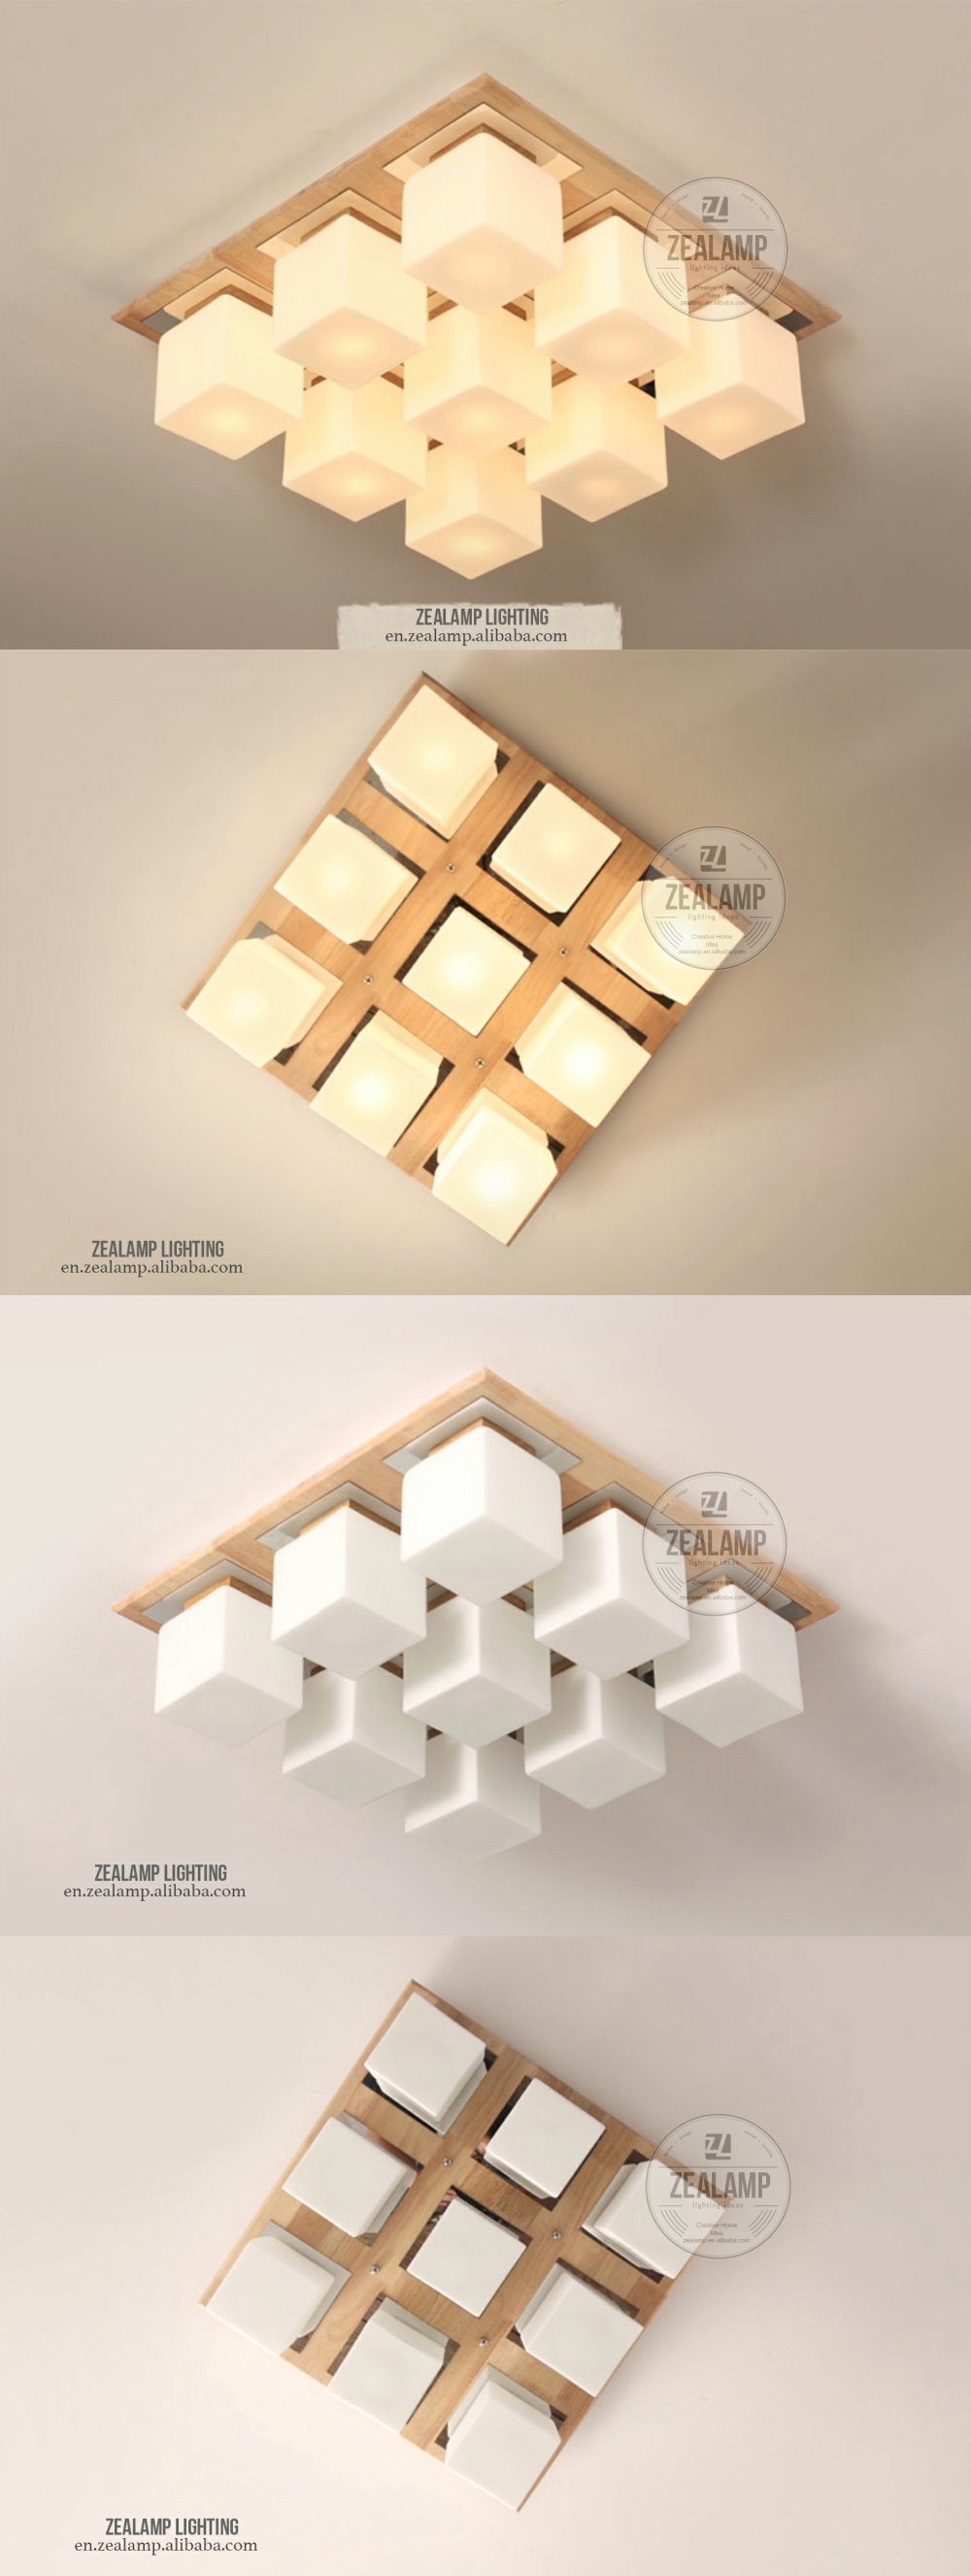 Moderne korte massief hout plafondlamp 9 hoofden glas gang balkon ...